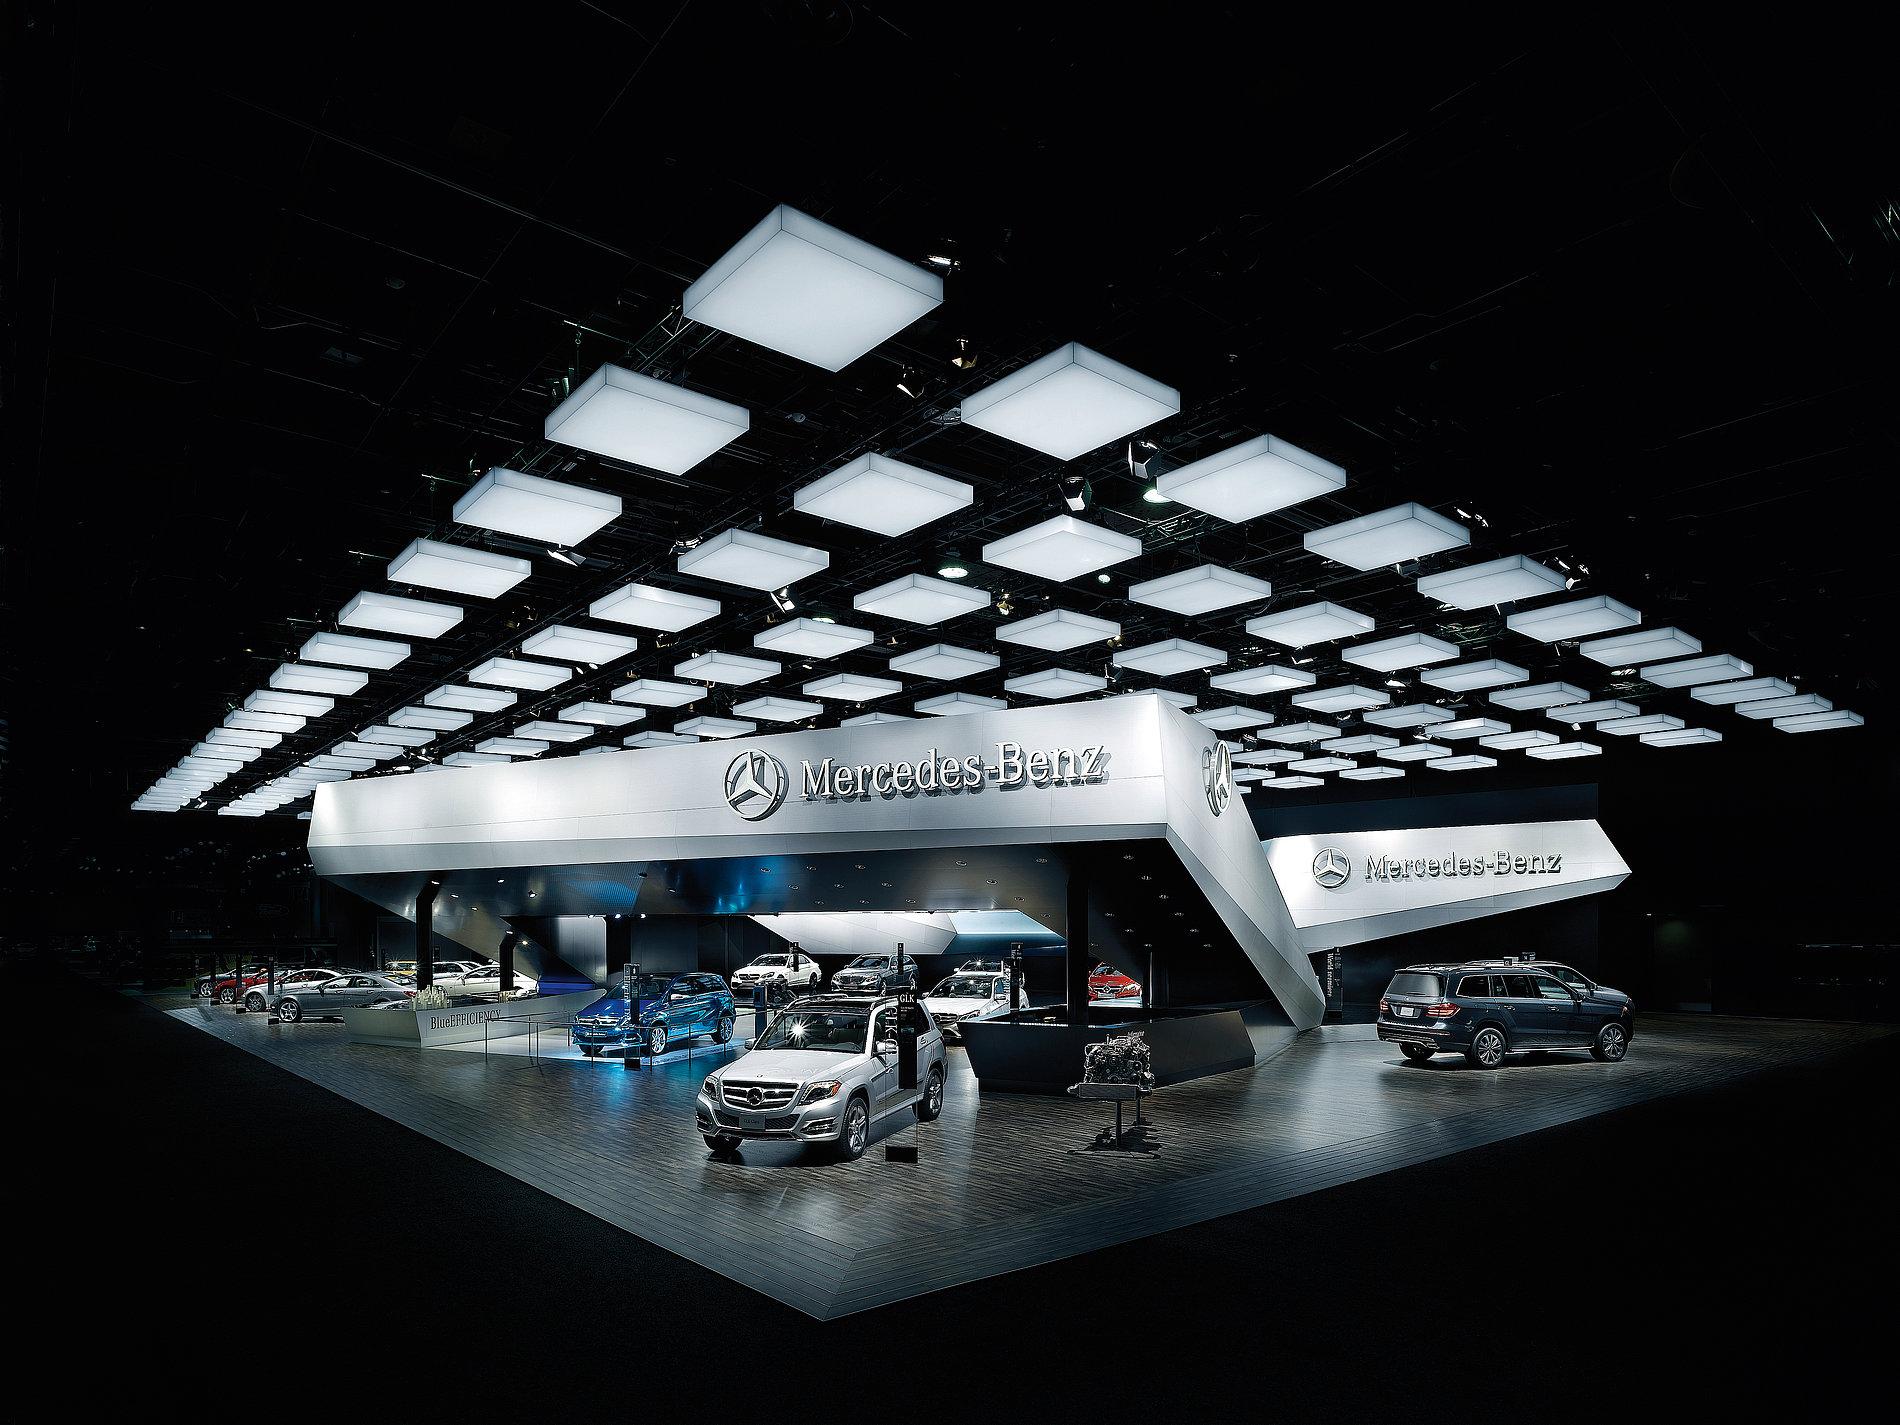 Mercedes-Benz Trade Fair Stand Detroit Auto Show 2013   Red Dot Design Award